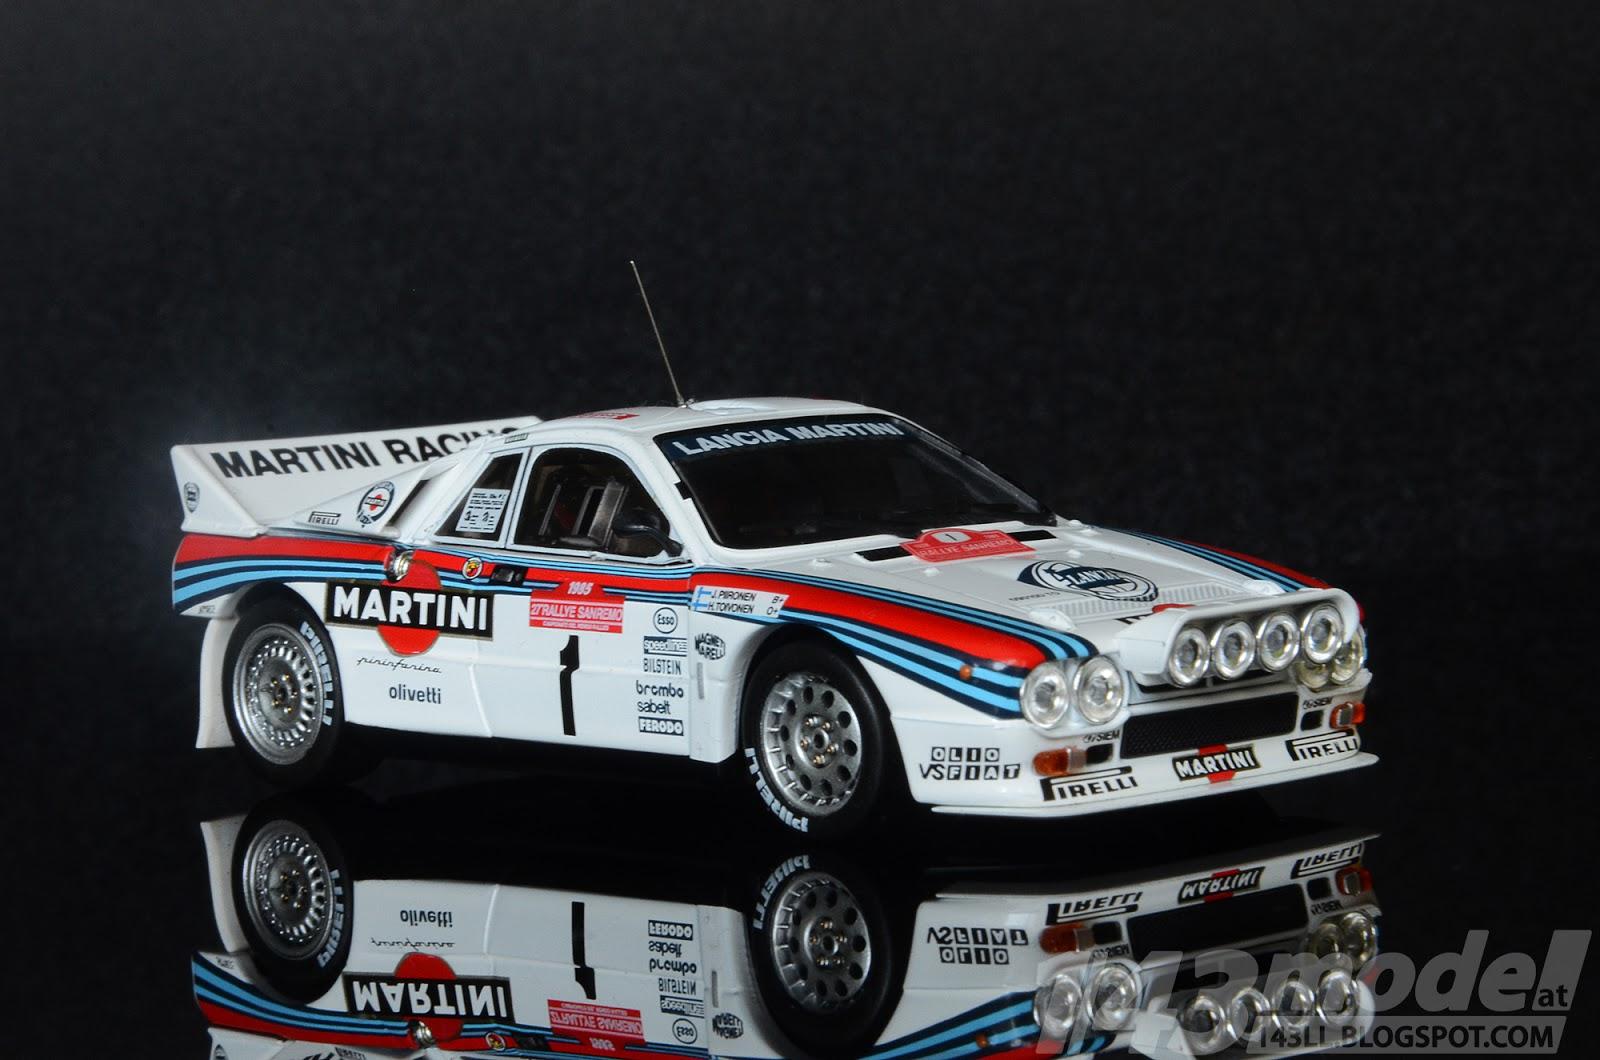 143modell: lancia martini 037, hpi racing 1/43